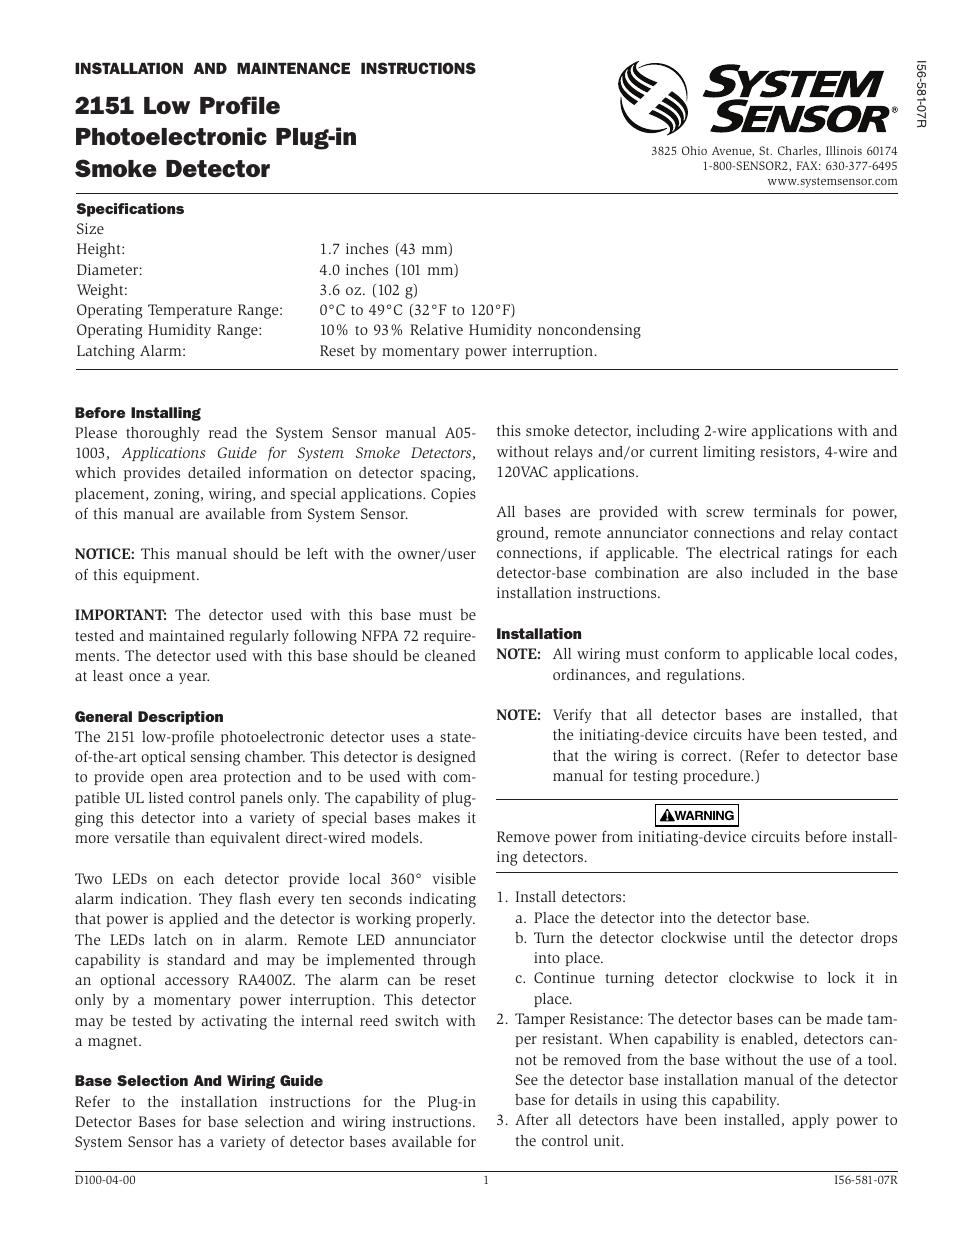 system sensor 2151 old style user manual 4 pages rh manualsdir com